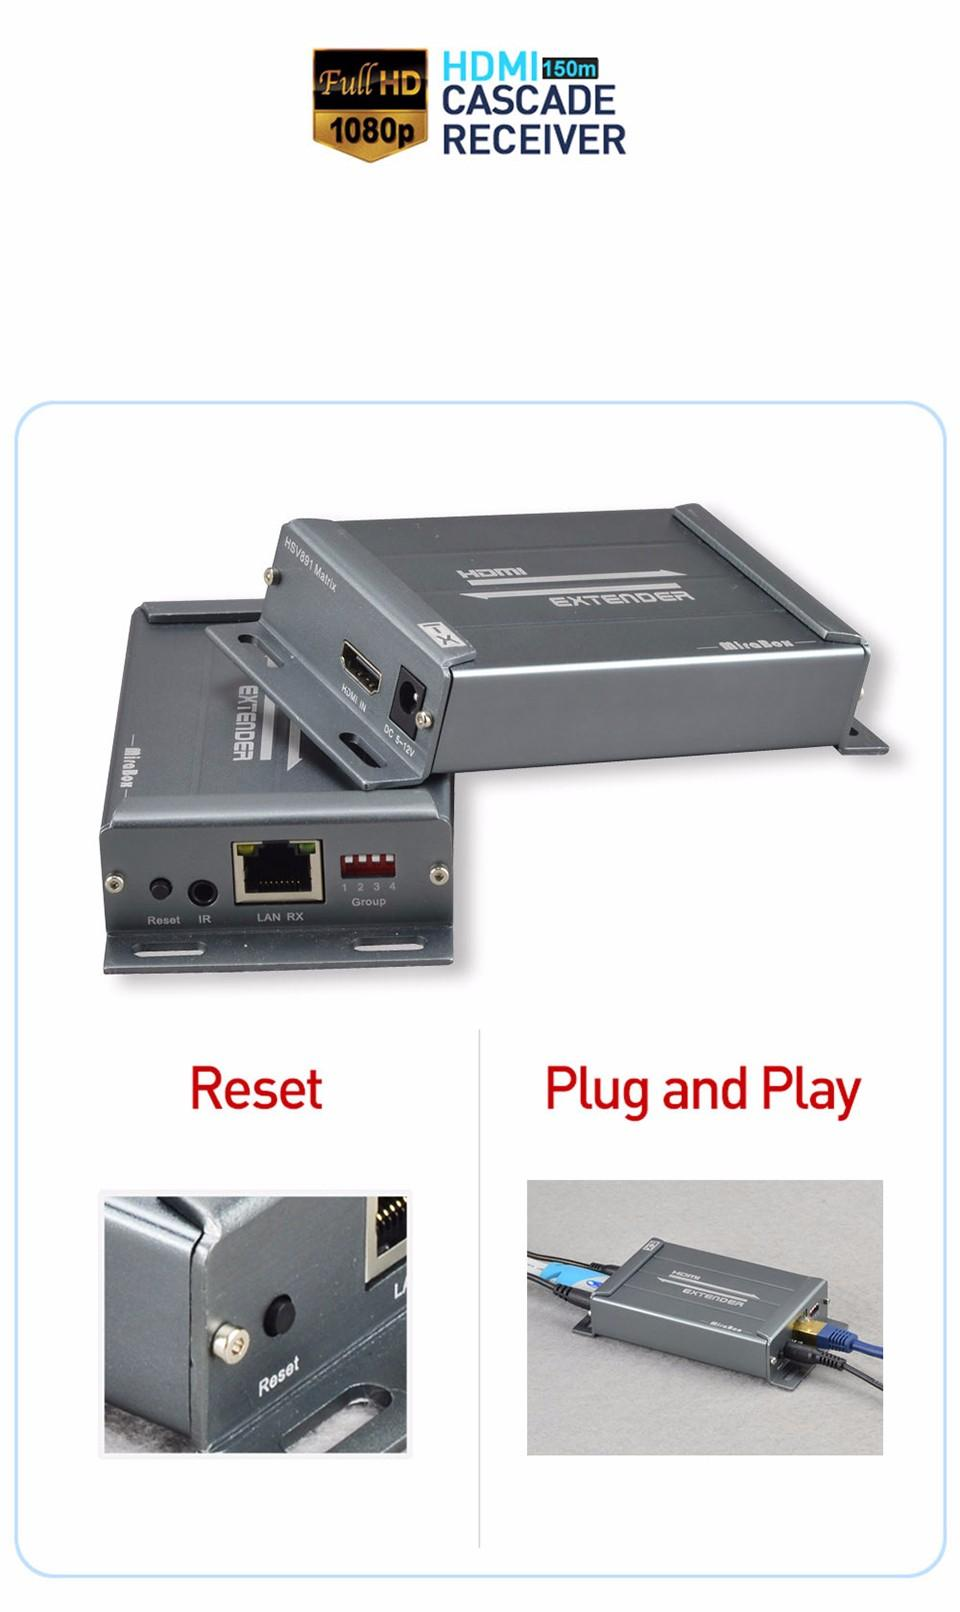 HDMI-EXTENDER-HSV891Matrix_10